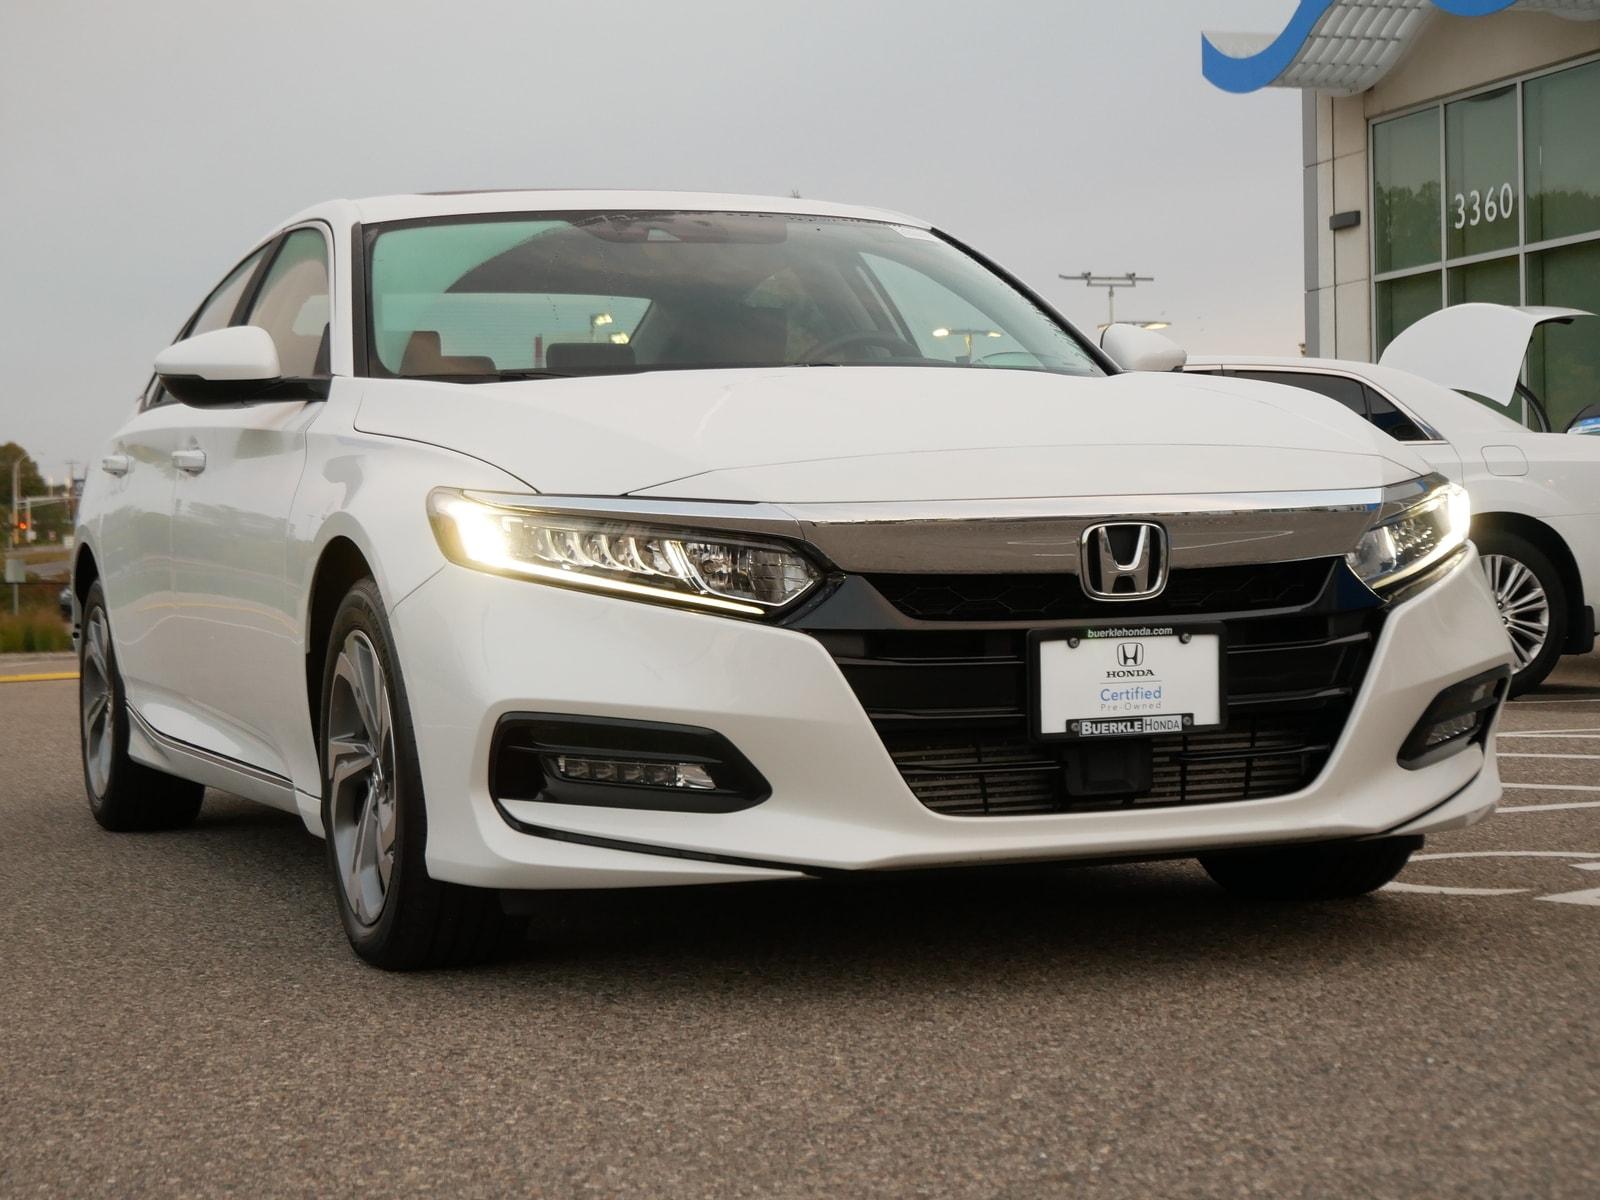 Certified 2019 Honda Accord EX-L with VIN 1HGCV2F50KA017814 for sale in Saint Paul, Minnesota